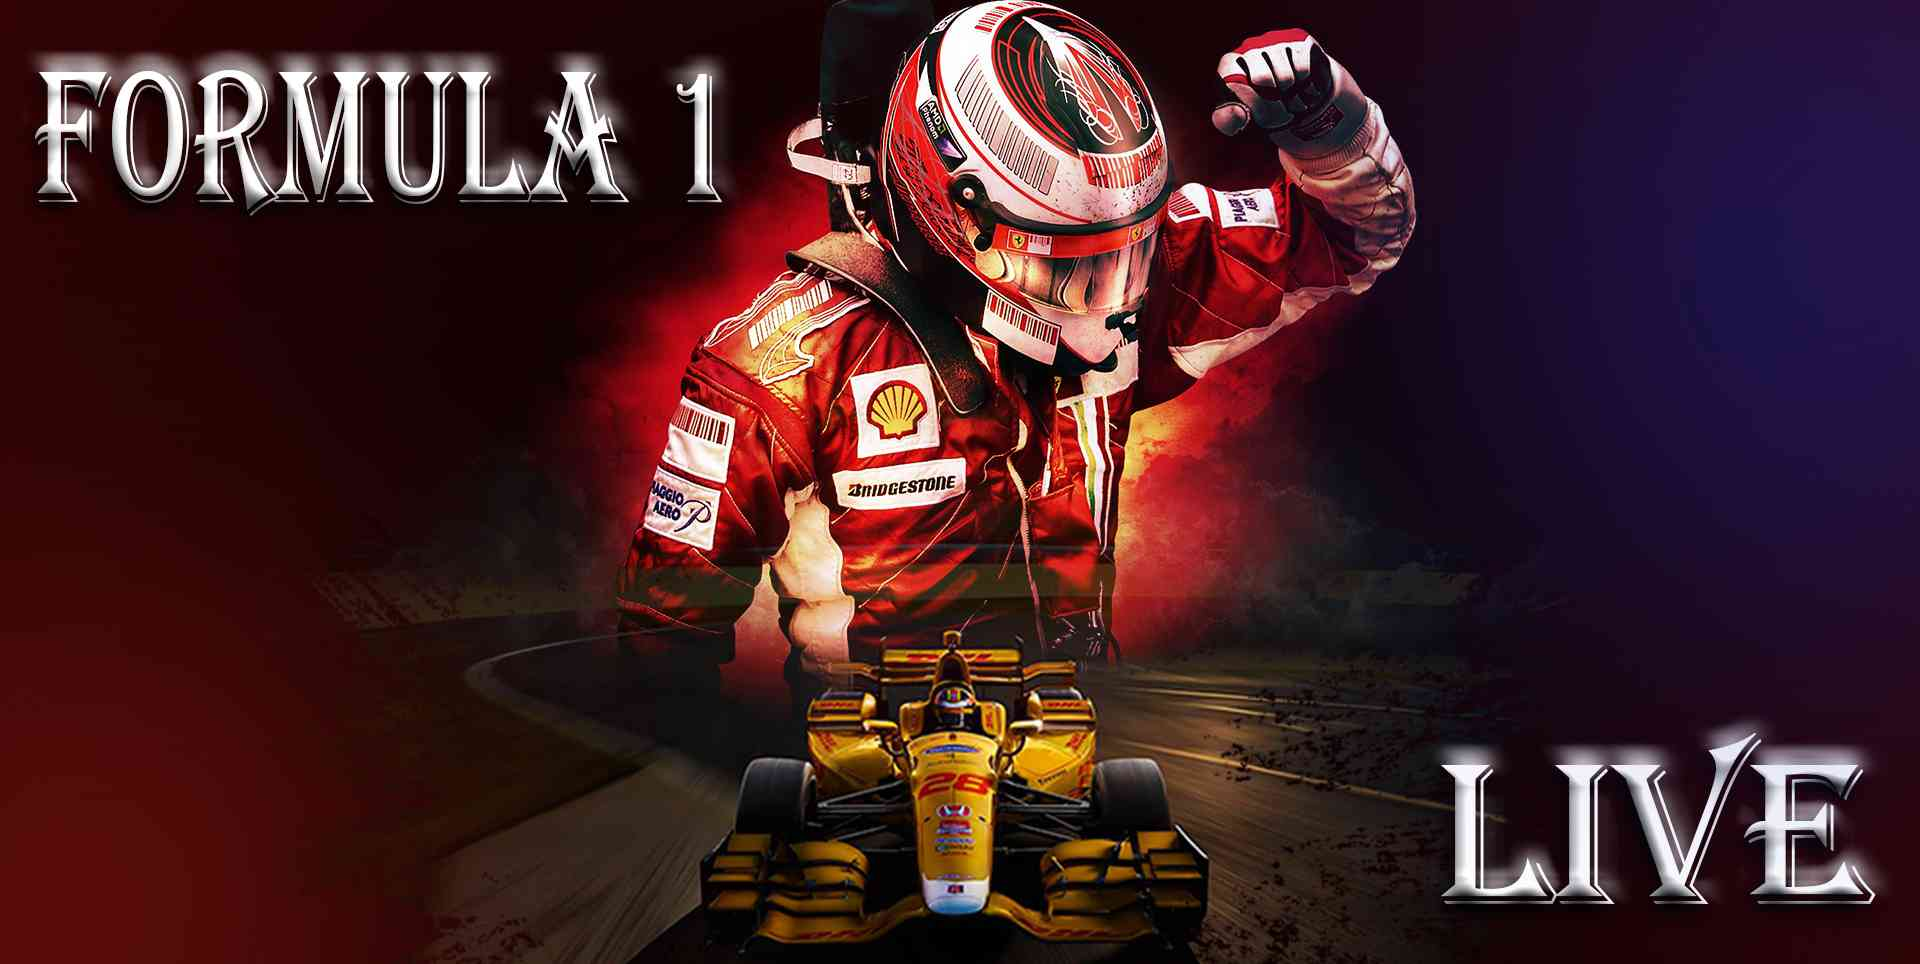 adac-formula-4-sachsenring-race-2016-live